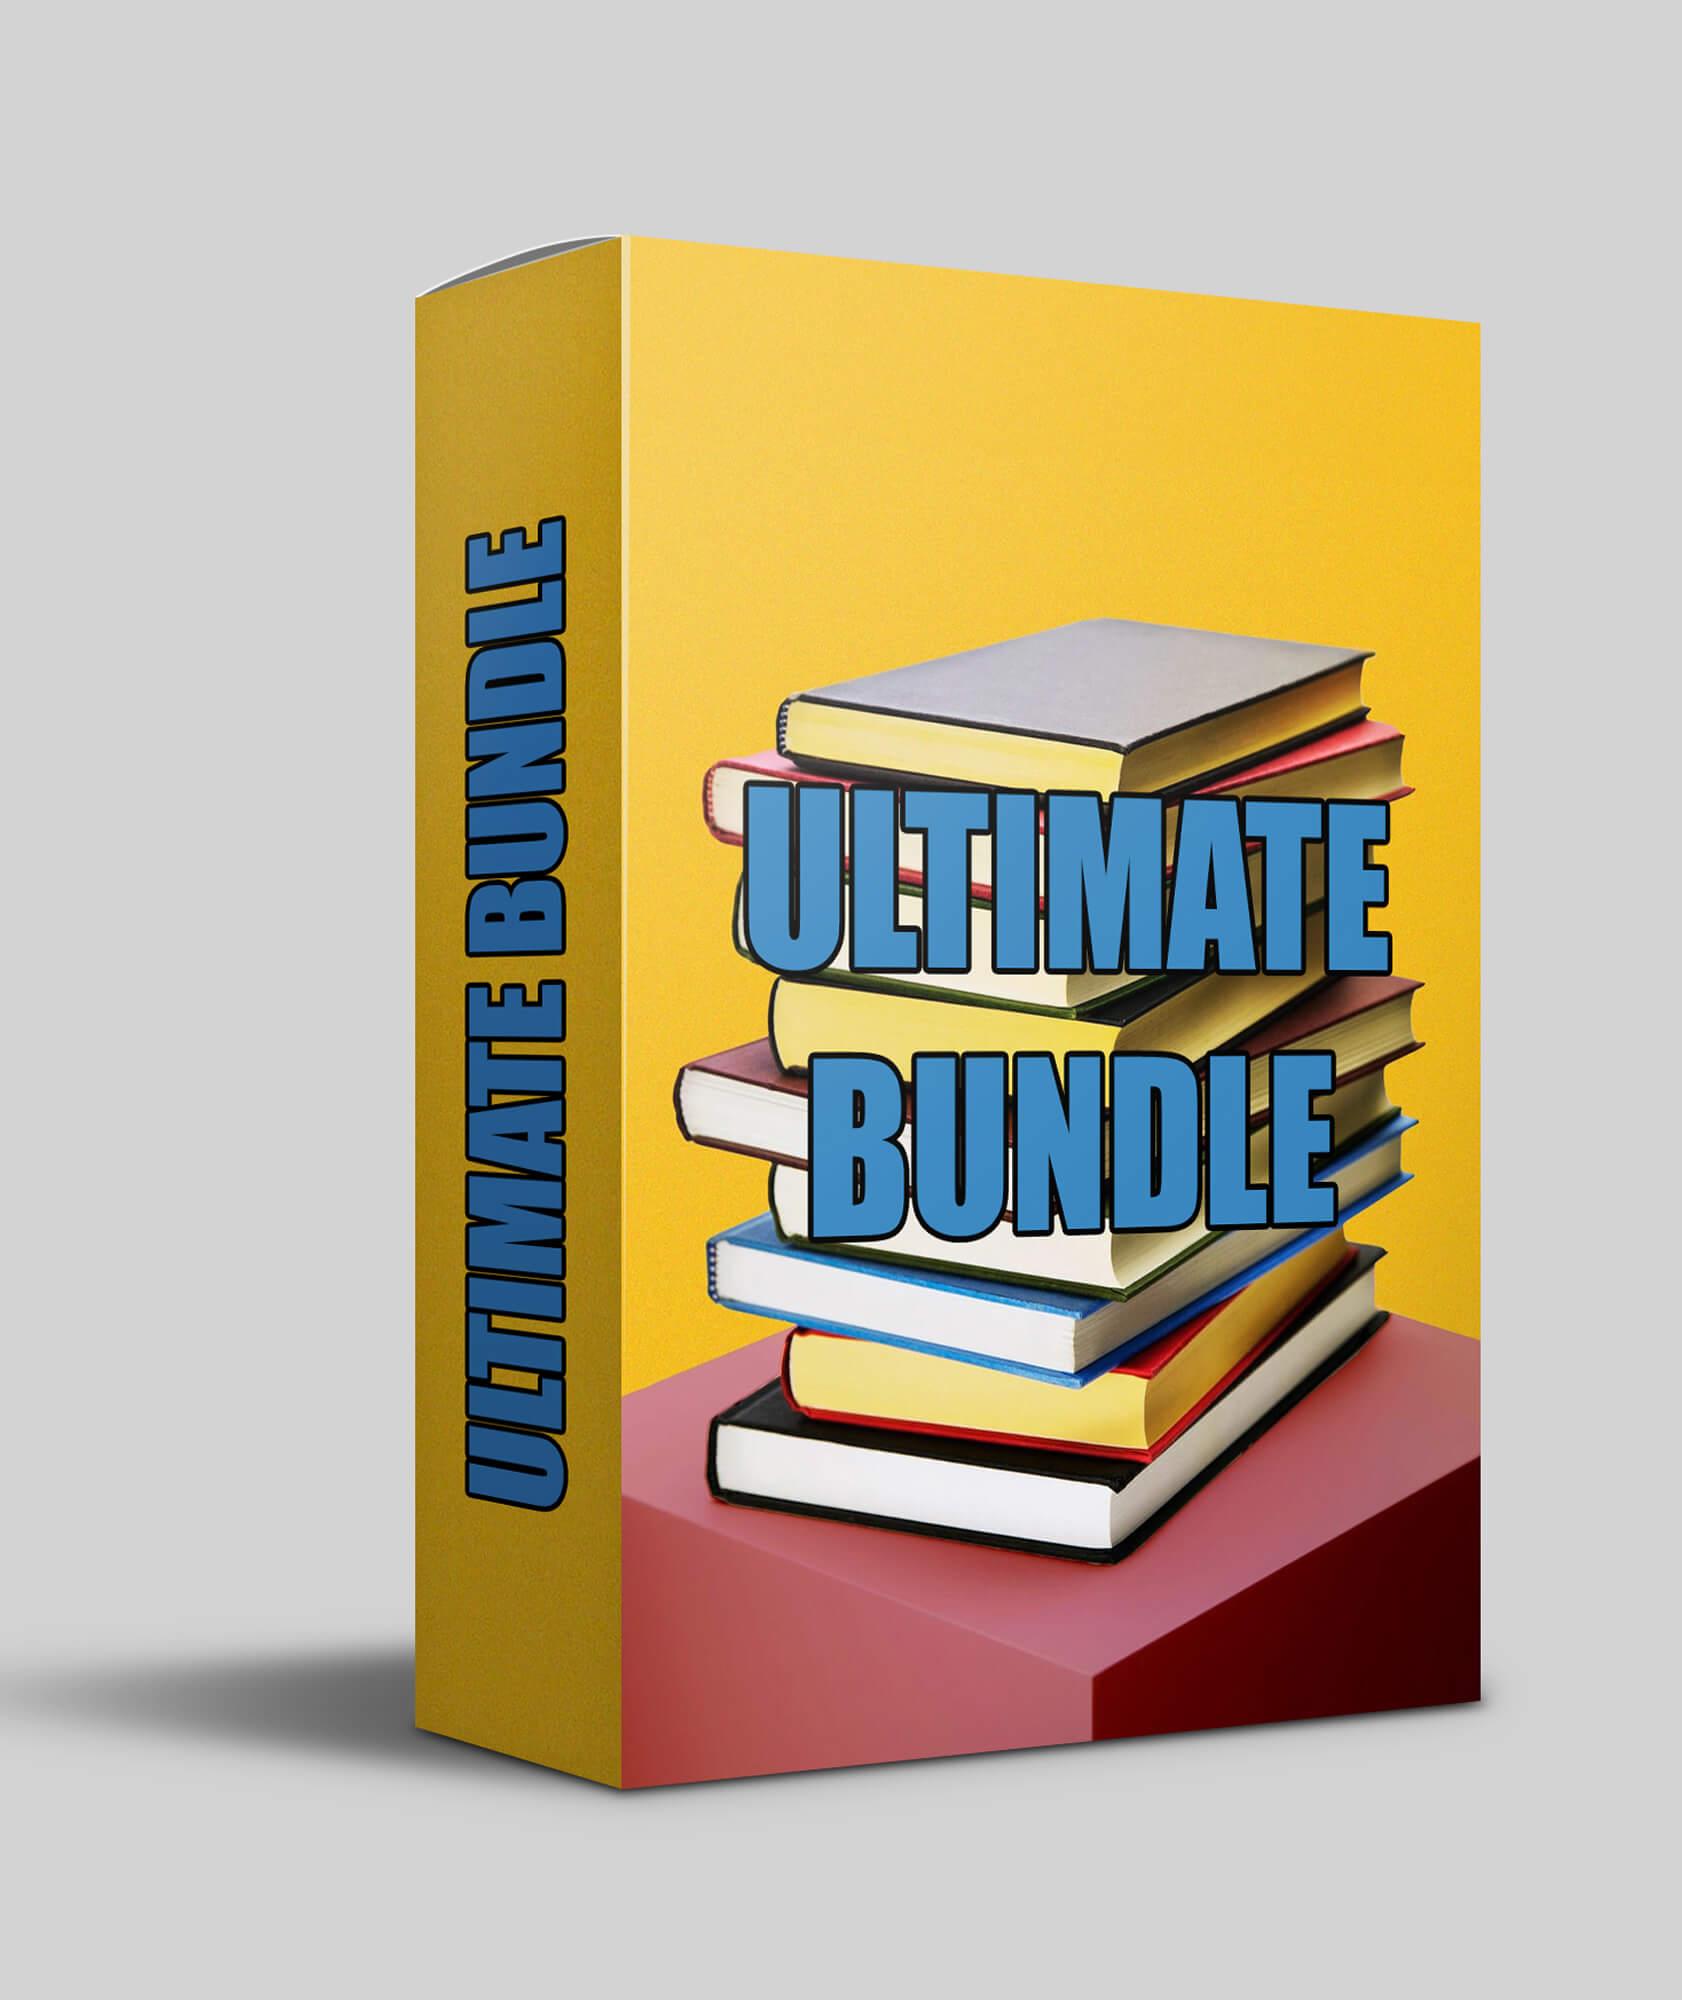 Ultimate Bundle